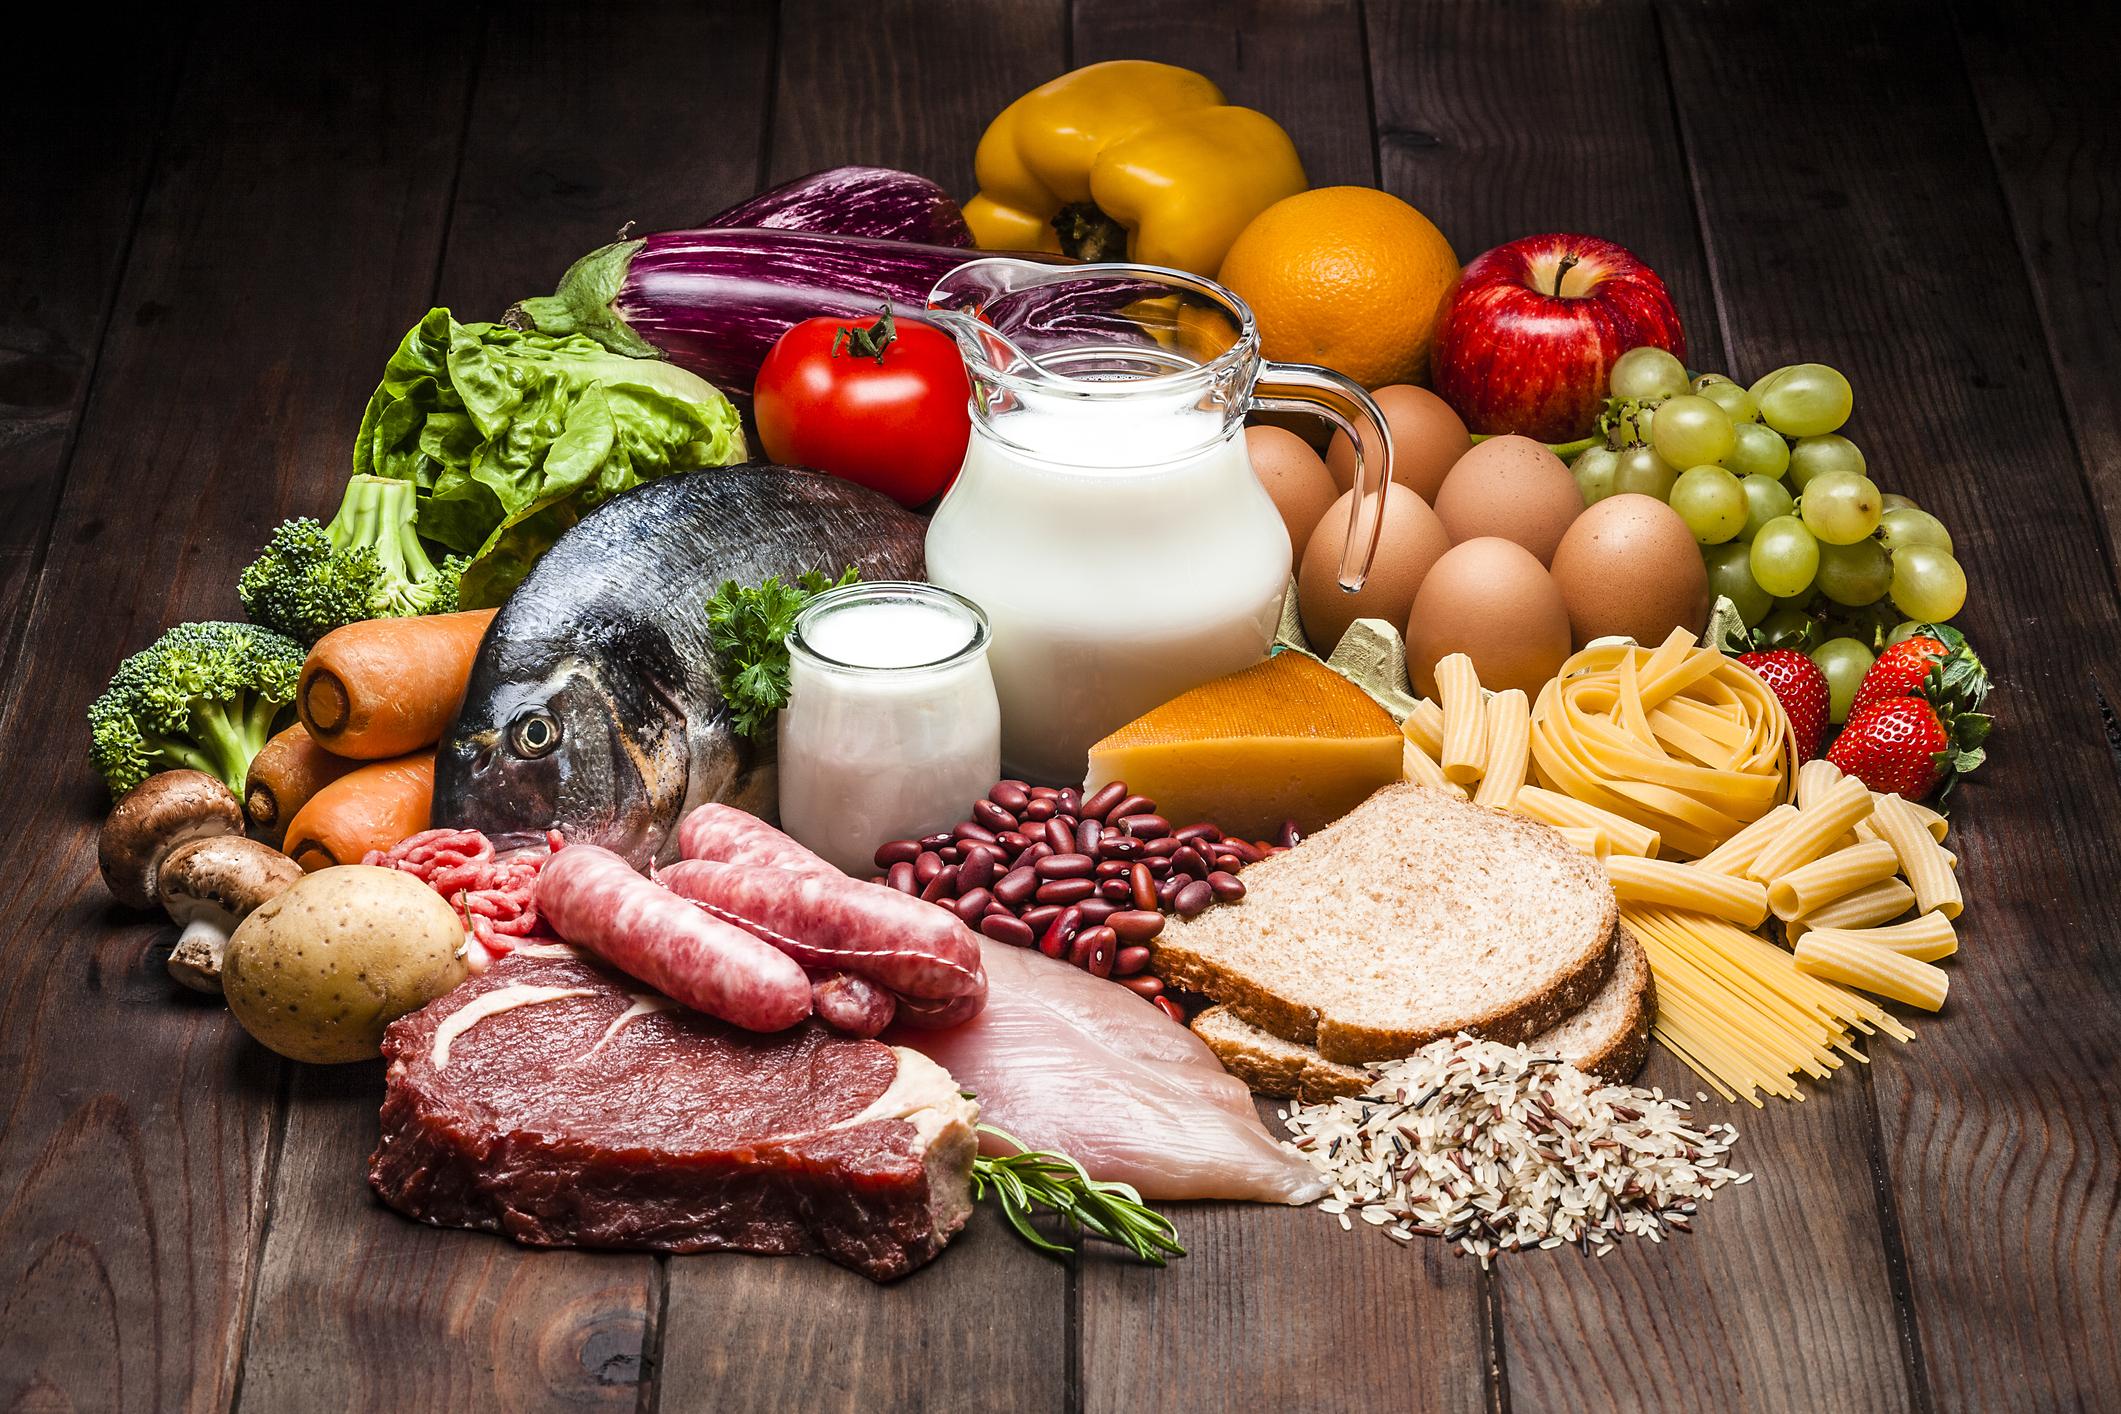 ريجيم غذائي متنوع لفقدان الوزن الزائد بدون حرمان